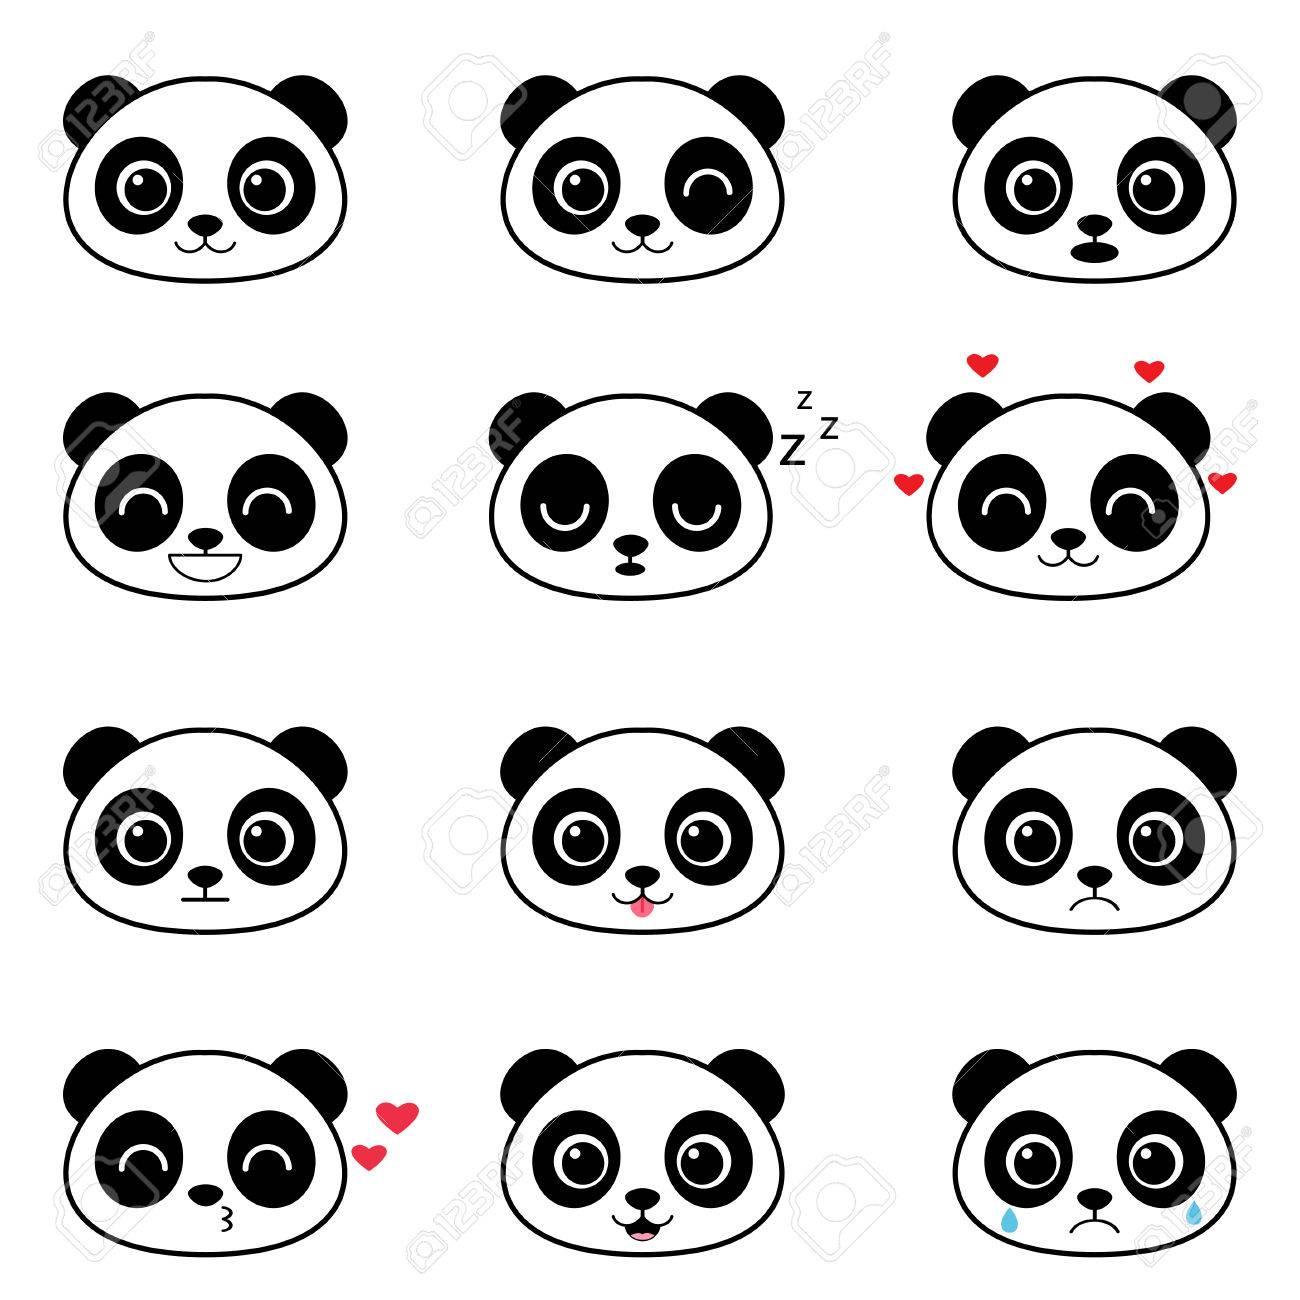 Set Of Cute Cartoon Panda Emotions Royalty Free Cliparts Vectors And Stock Illustration Image 71631204